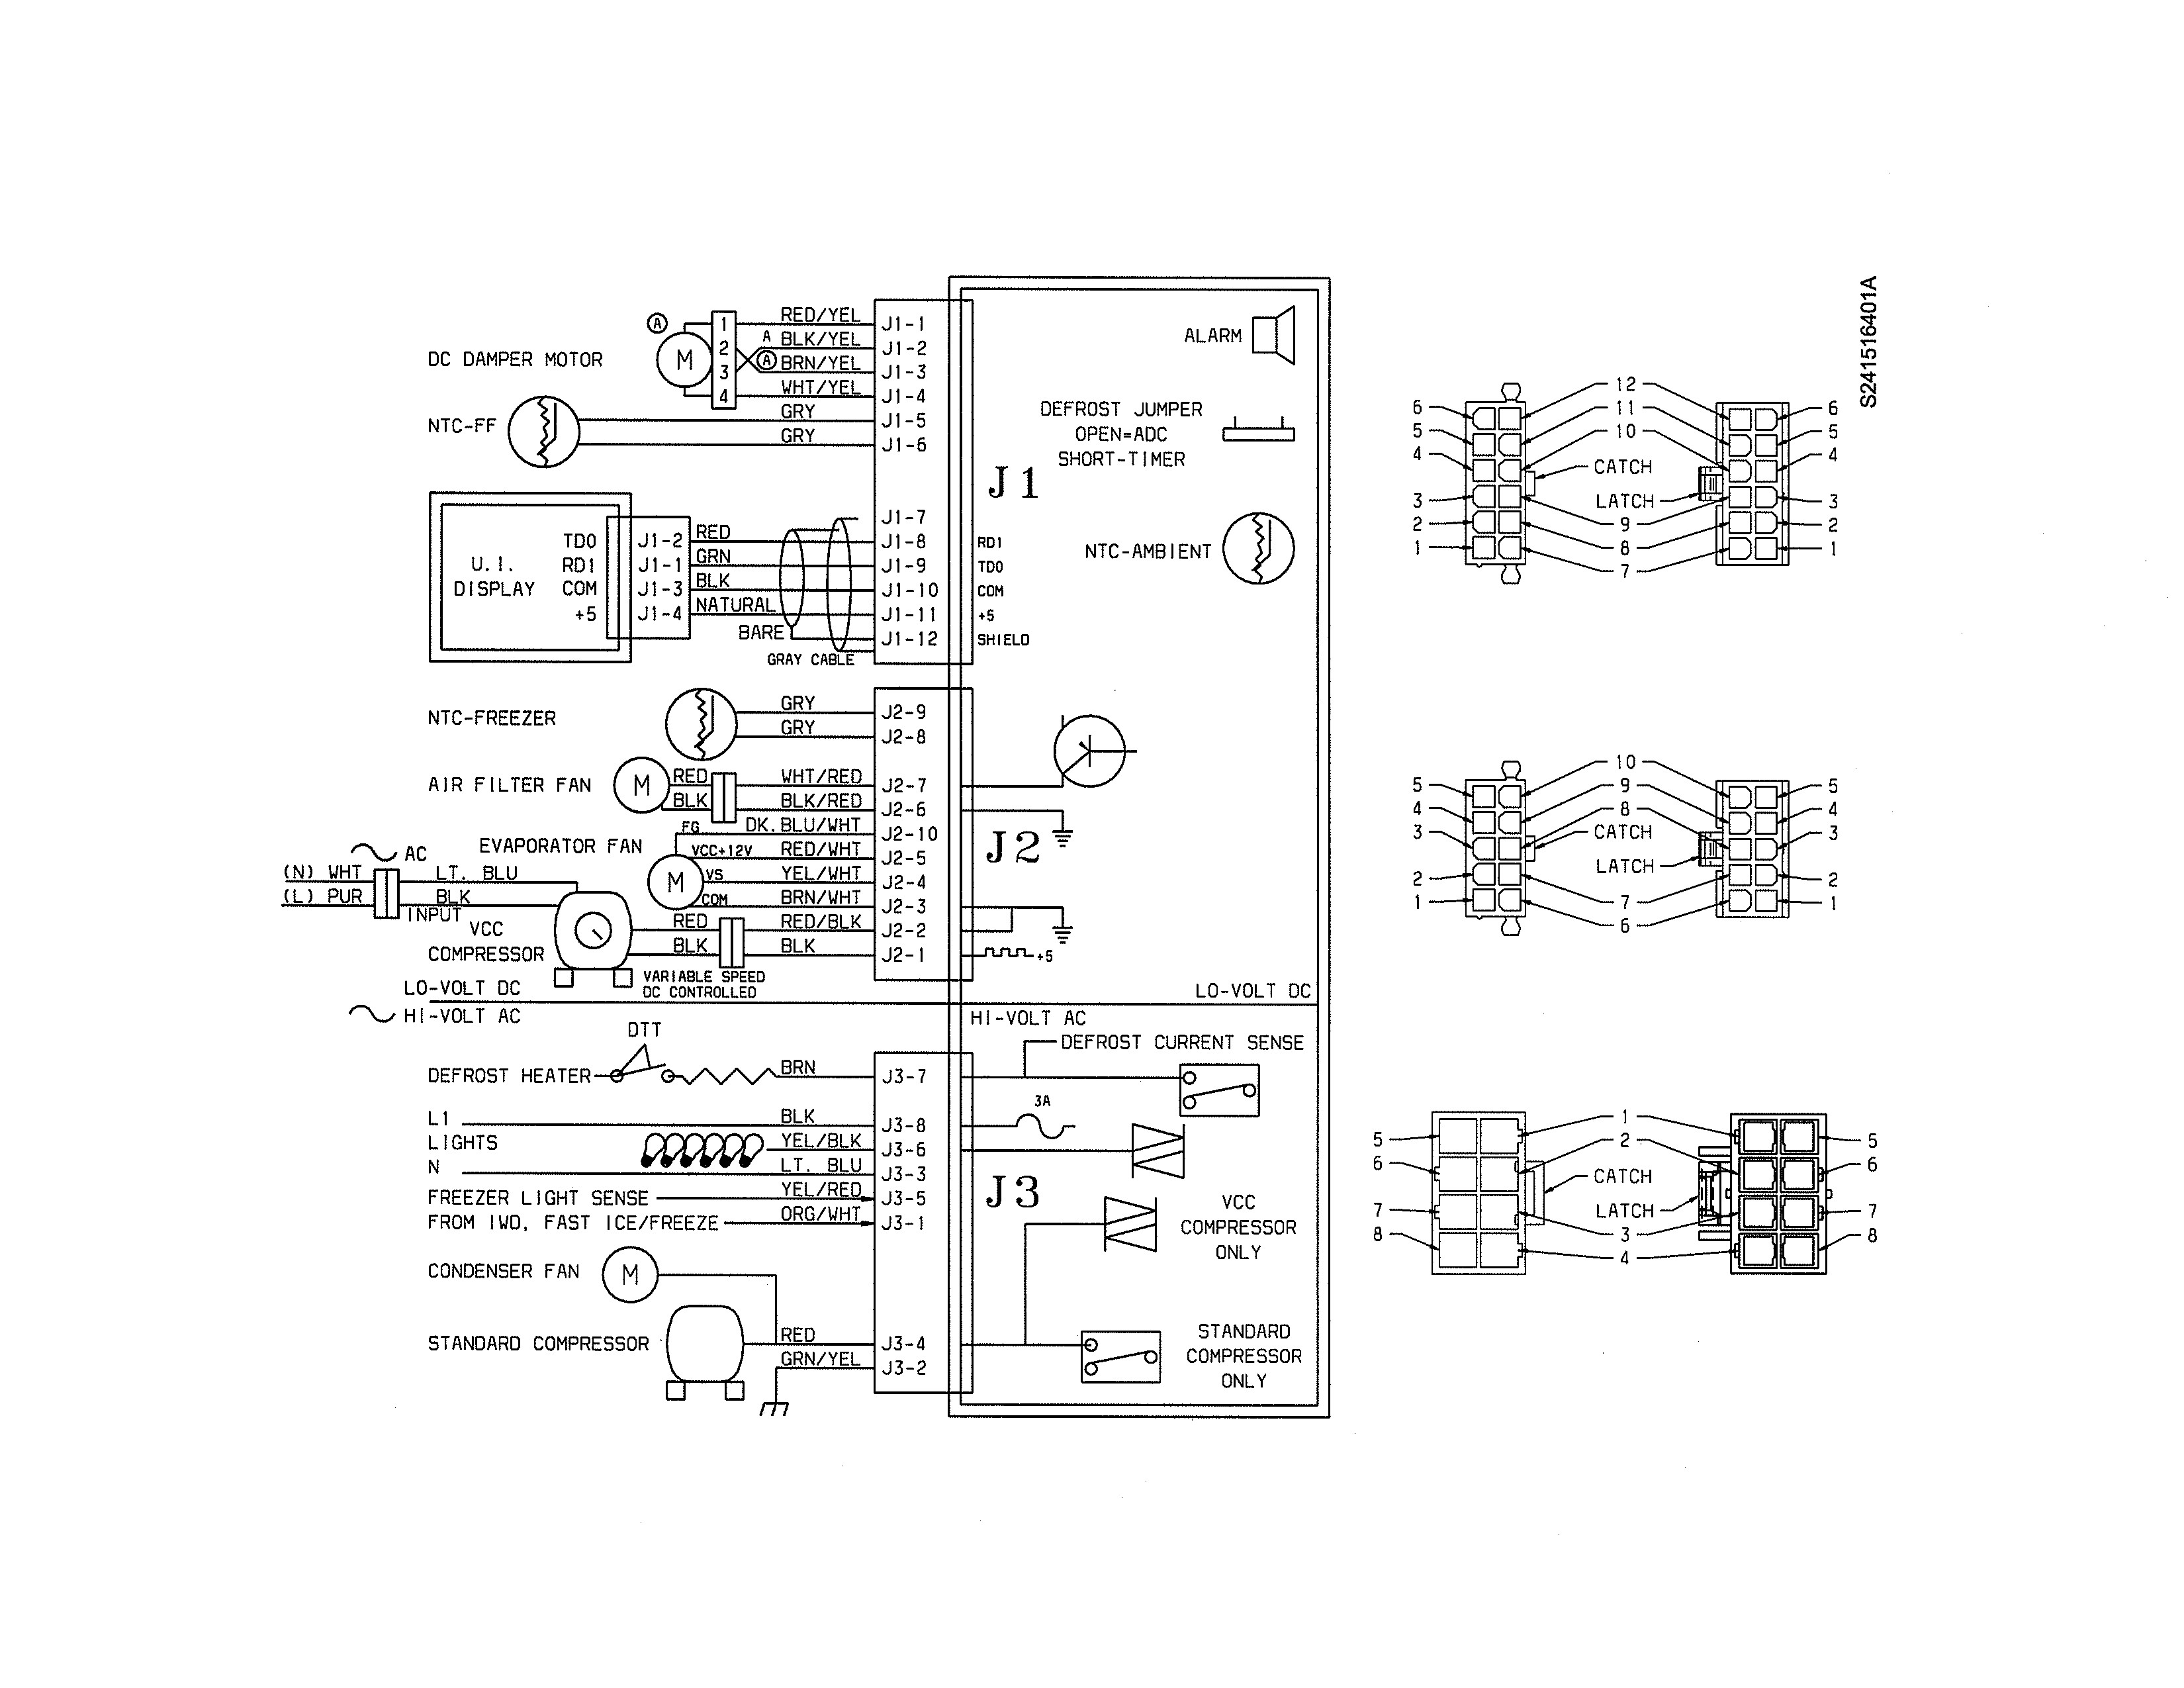 kenmore elite wiring diagram Collection-Refrigeration Wiring Diagram Symbols Refrence Kenmore Elite Refrigerator Wiring Diagram Roc Grp 19-t